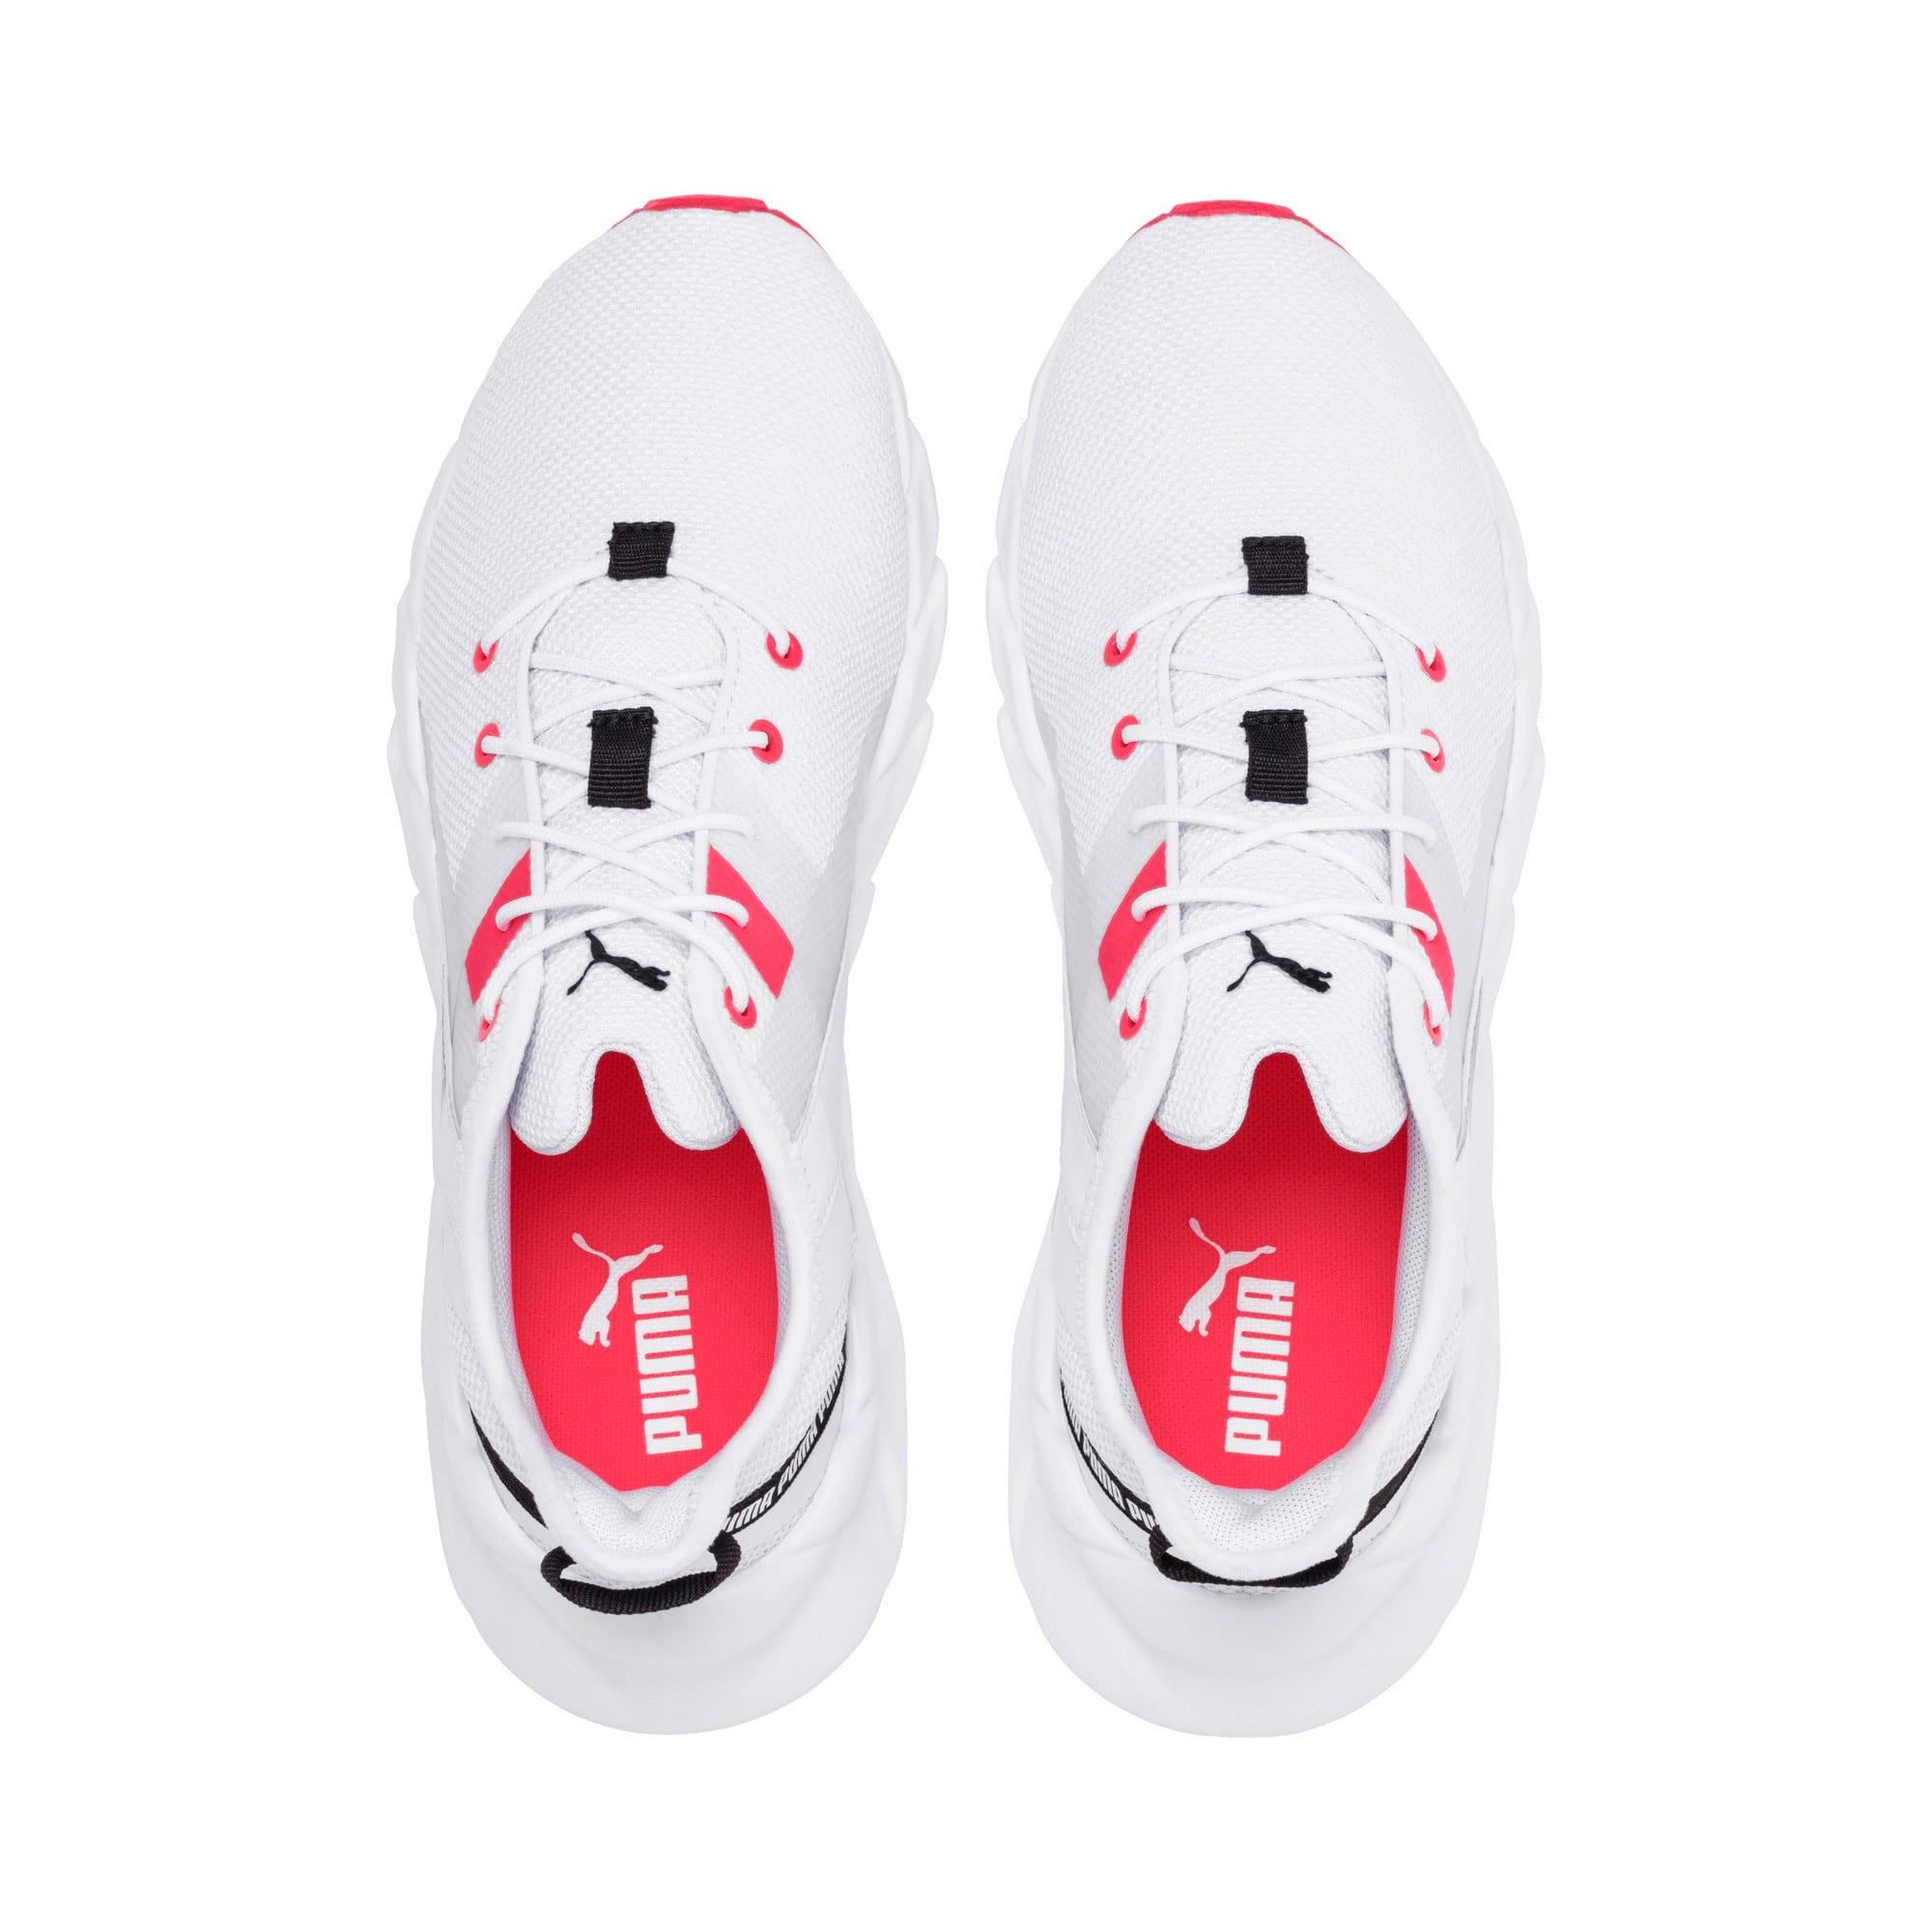 Thumbnail 11 of Weave XT Women's Training Shoes, Puma White-Pink Alert, medium